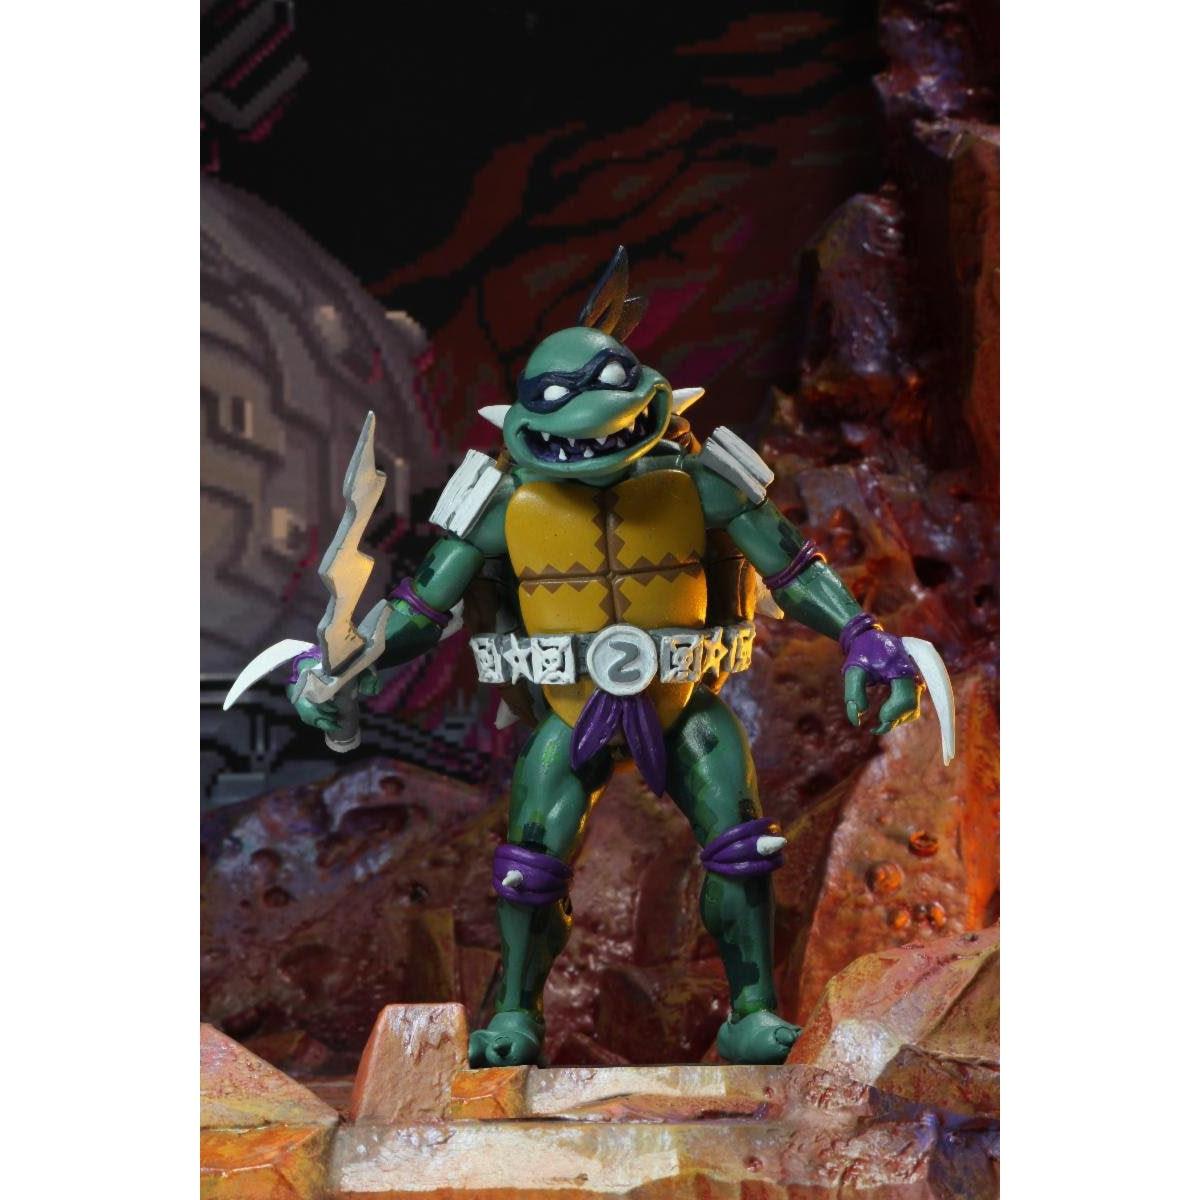 "Image of TMNT: Turtles in Time - 7"" Scale Action Figures - Slash - BACKORDERED APRIL 2020"